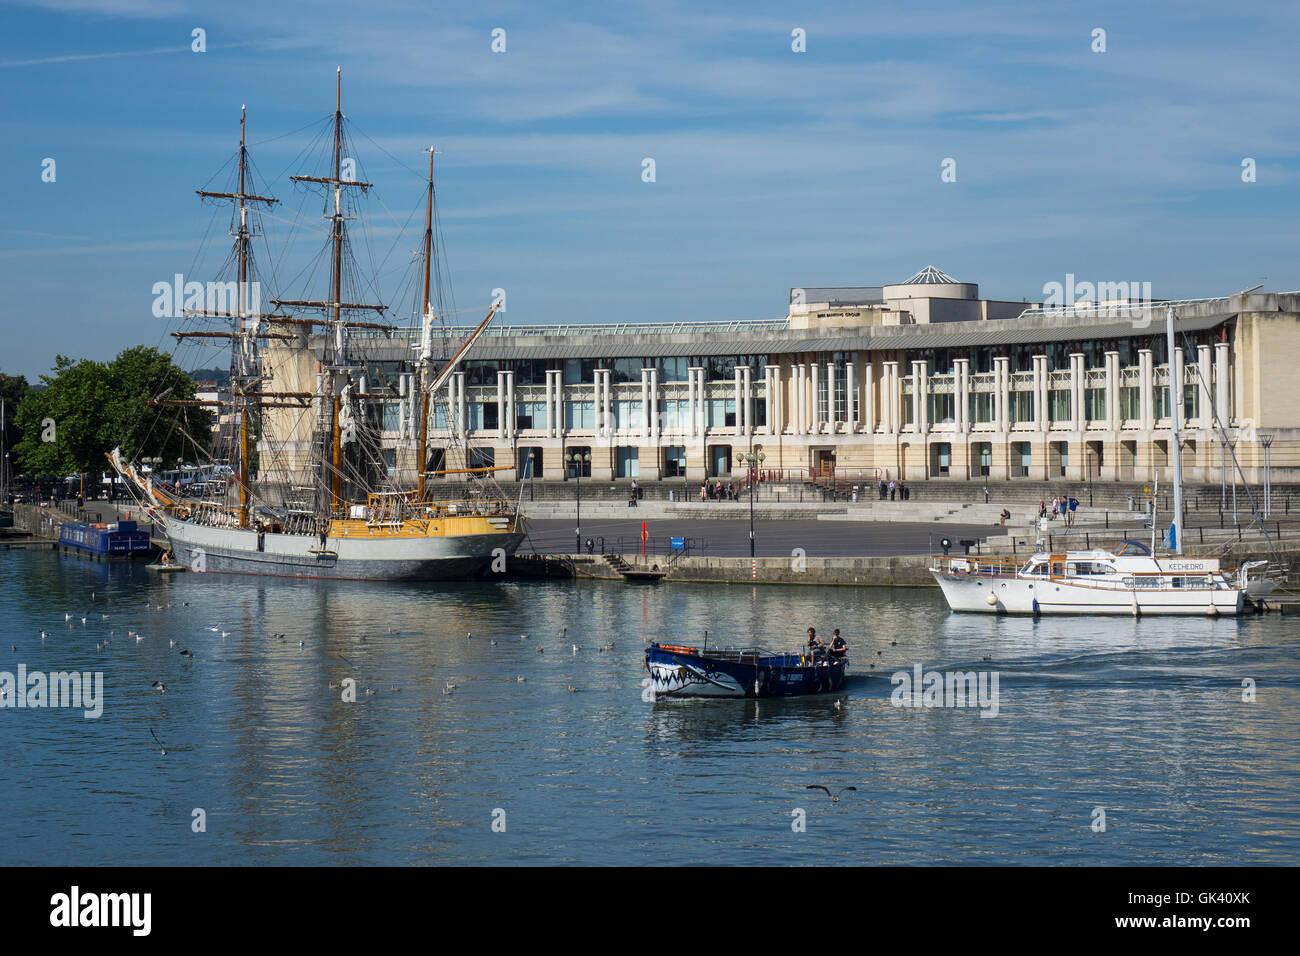 England, Bristol, Harbour & Amphitheatre - Stock Image